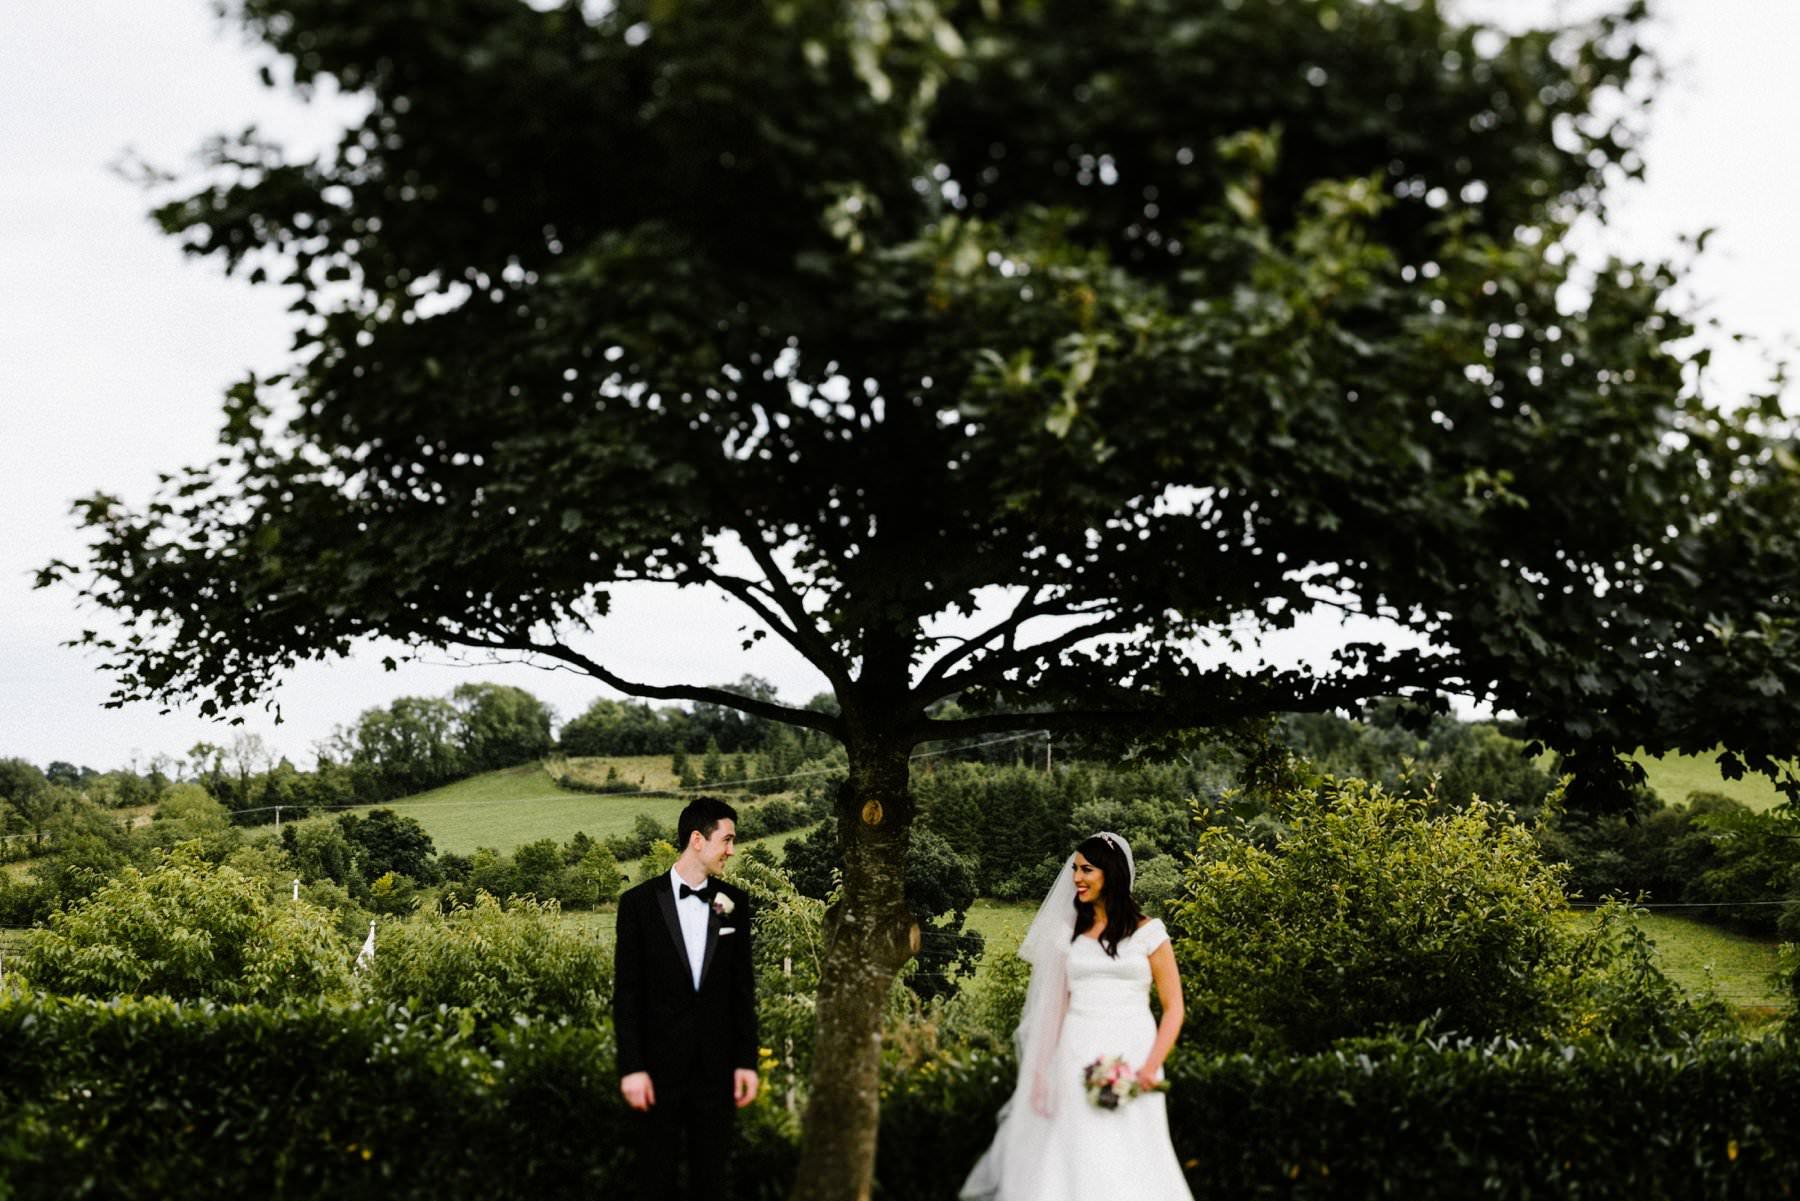 tilt shift wedding photography ireland